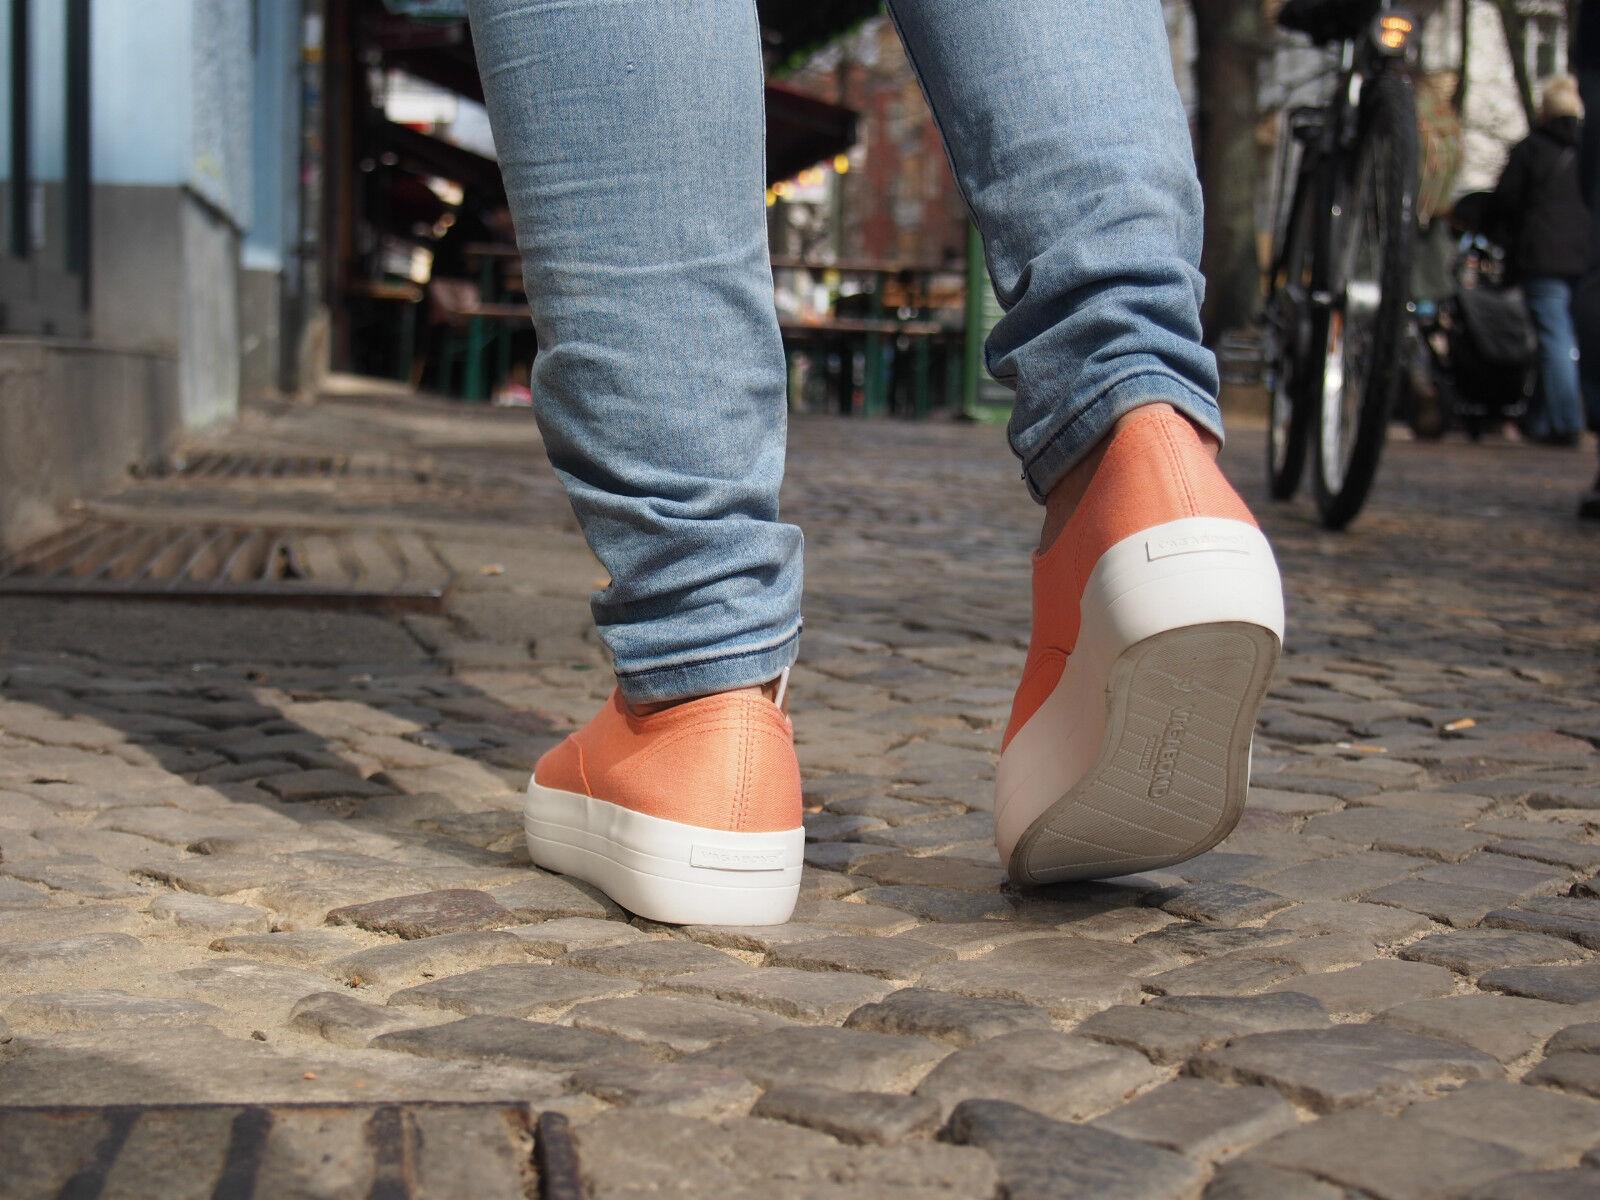 VAGABOND Schuhe KEIRA 4144-180-44 lt apricot NEU Damen Sneaker Plateausohle SALE